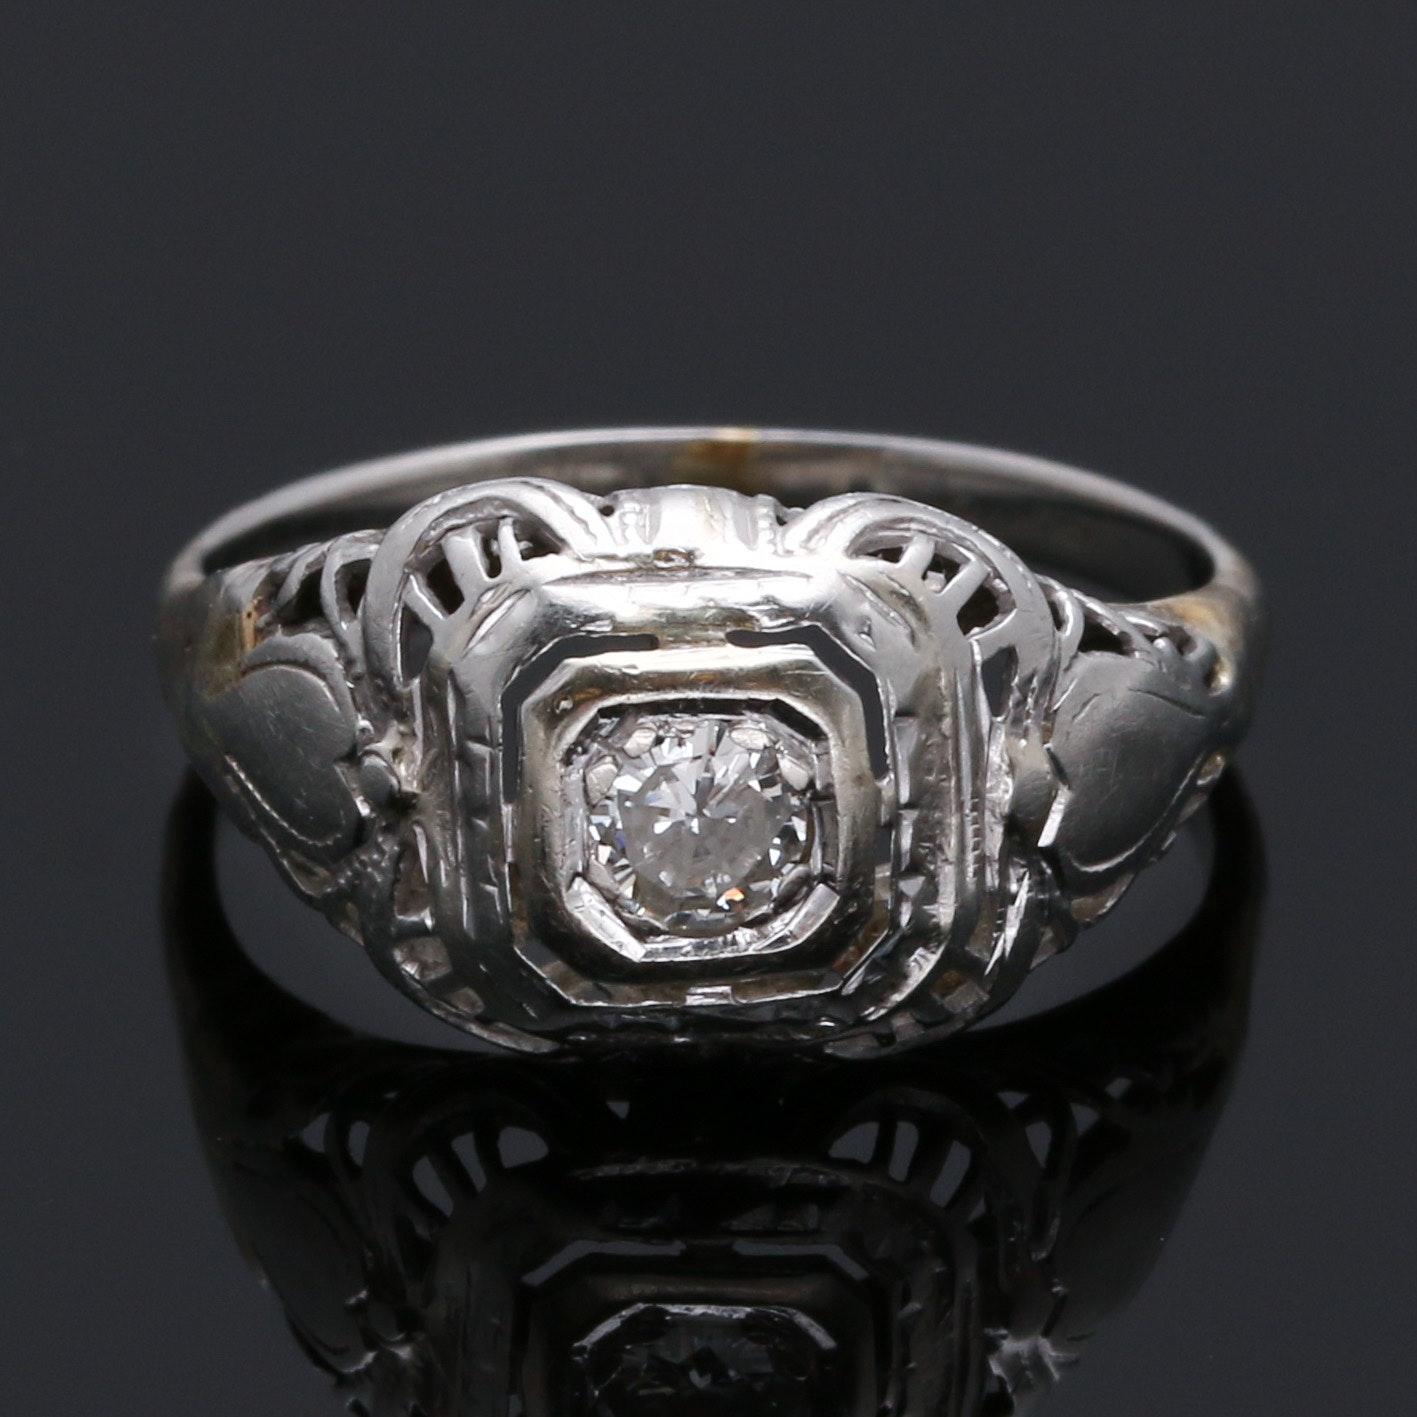 Vintage Circa 1930s 18K White Gold 0.16 CT Solitare Diamond Ring